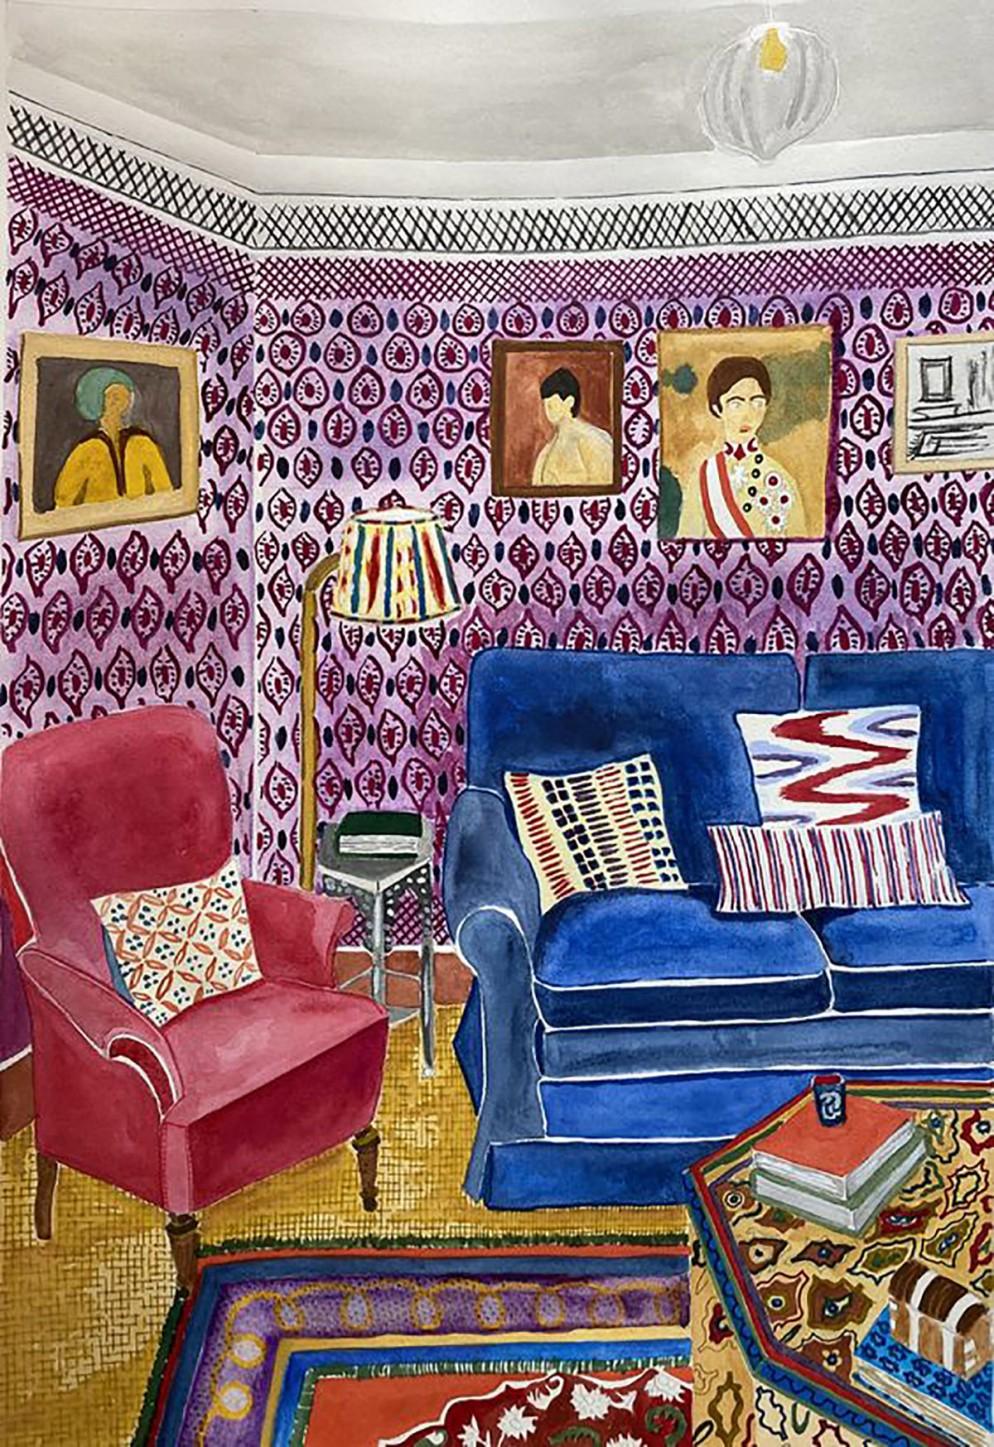 Pamela-Jaccarino-illustratori_living-corriere (3)